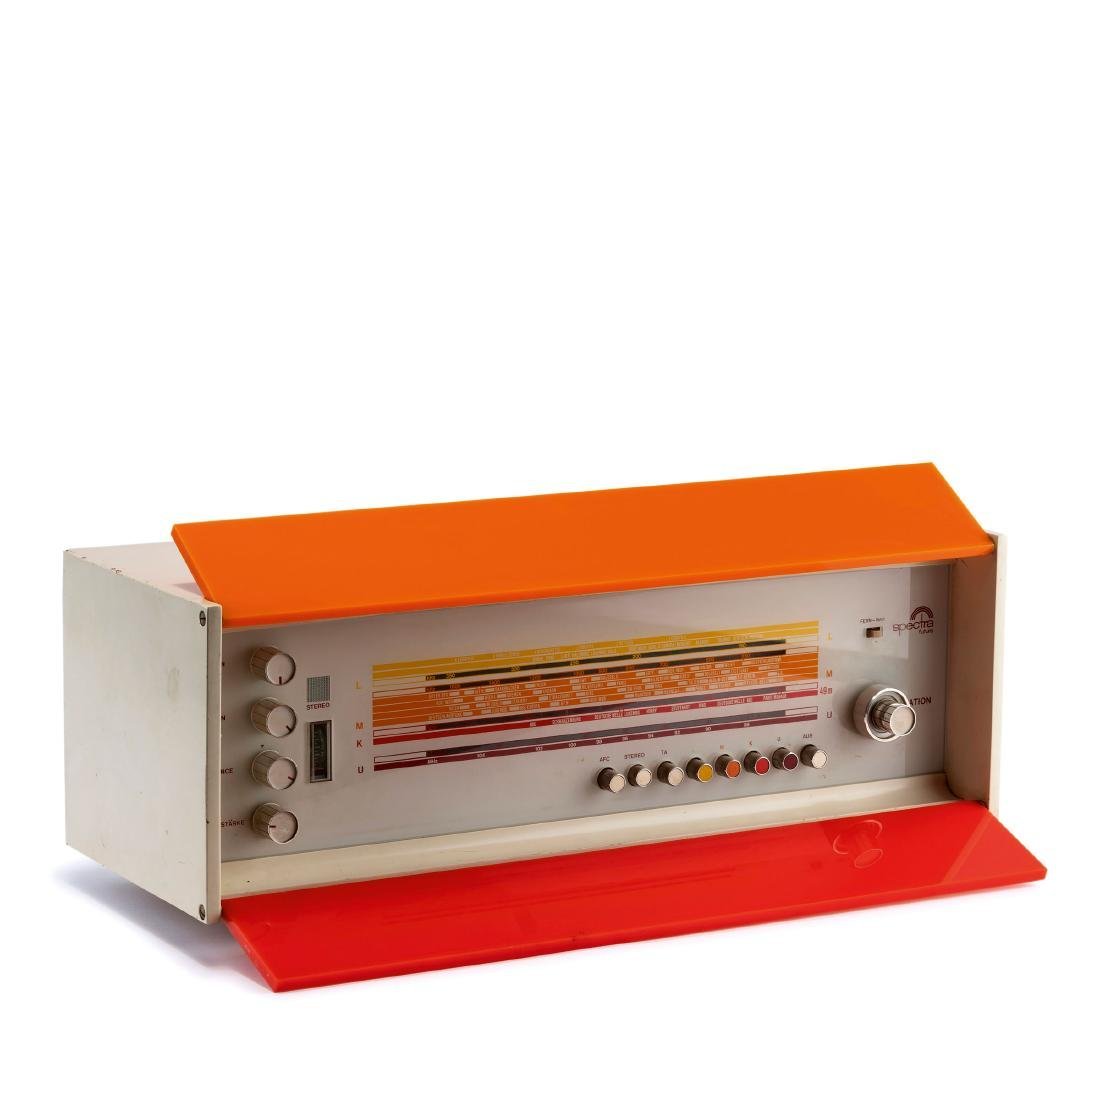 'Spectra Futura' - 'ST 969' radio, 1968/69